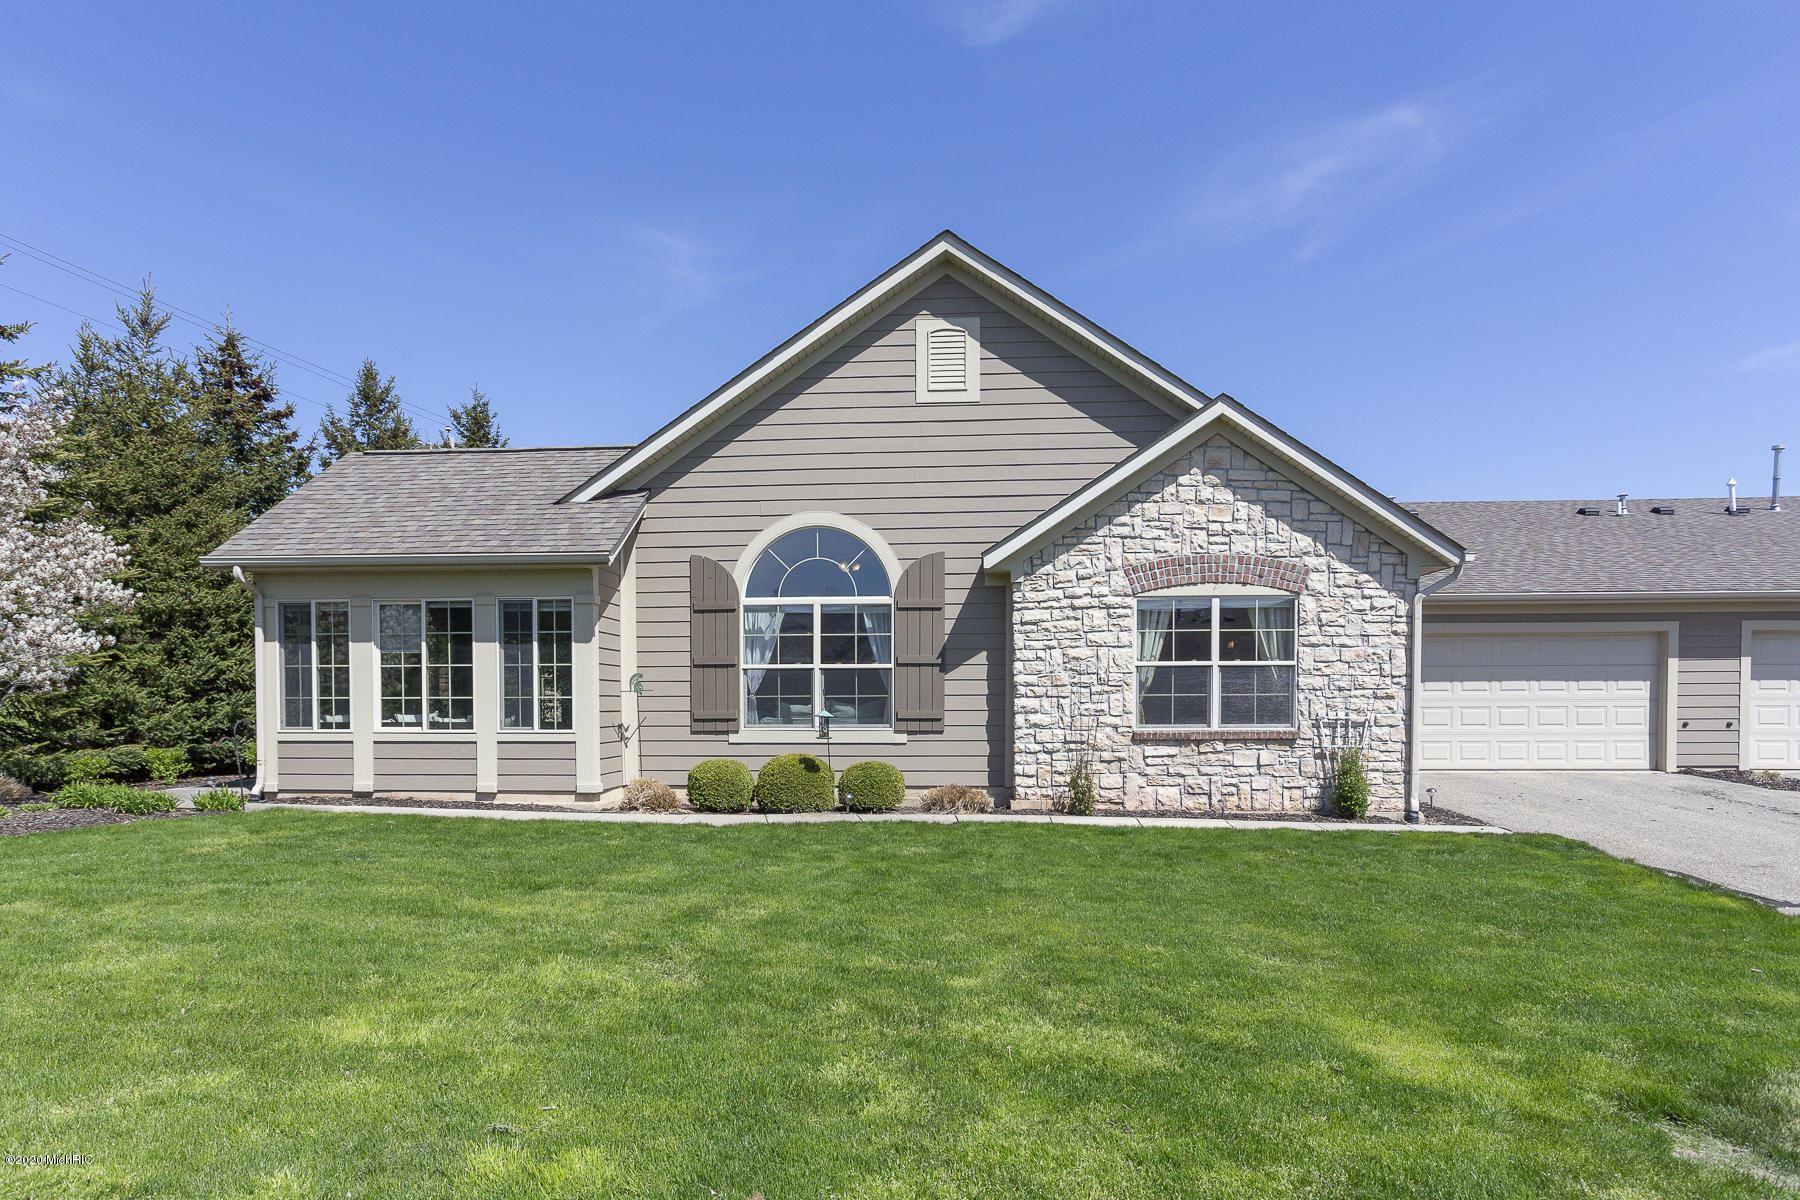 3533 Water Walk Drive SW, Grandville, MI 49418 - MLS#: 20014219